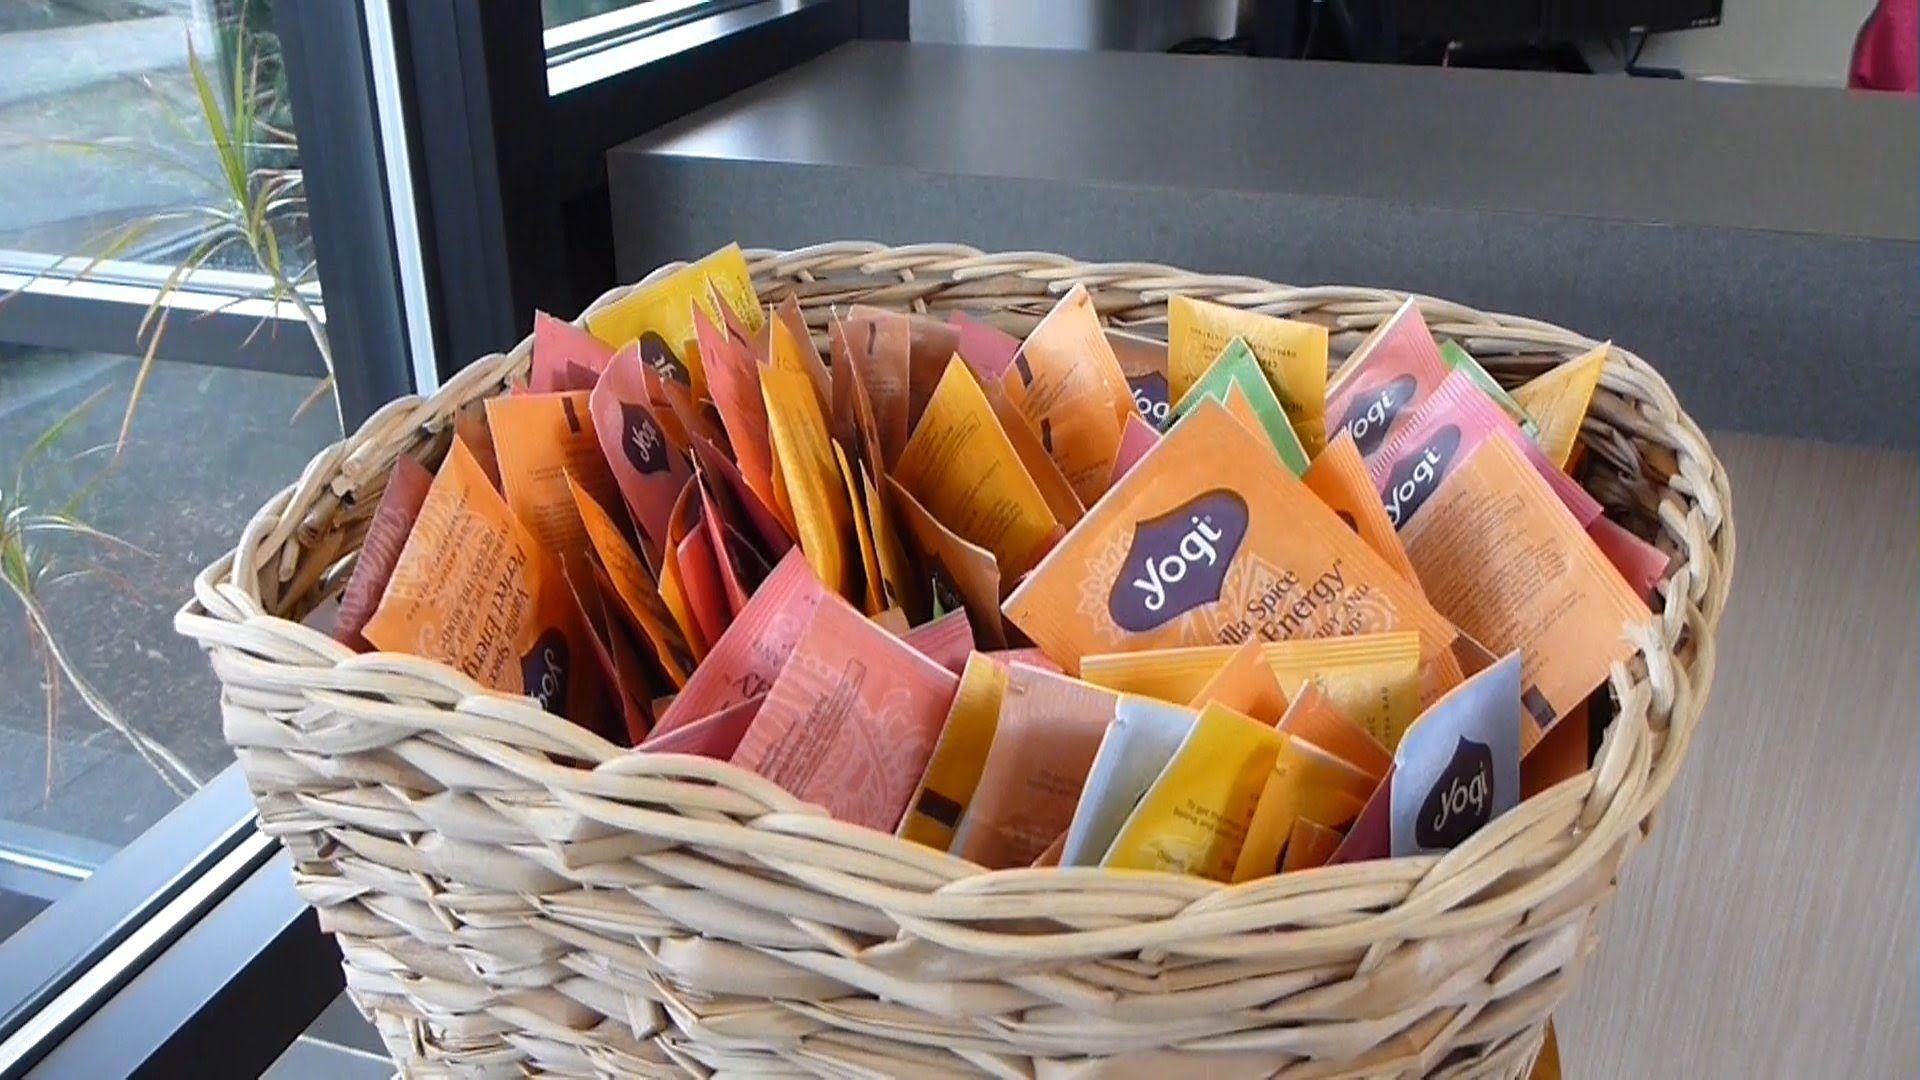 Free yogi tea samples at springfield oregon headquarters